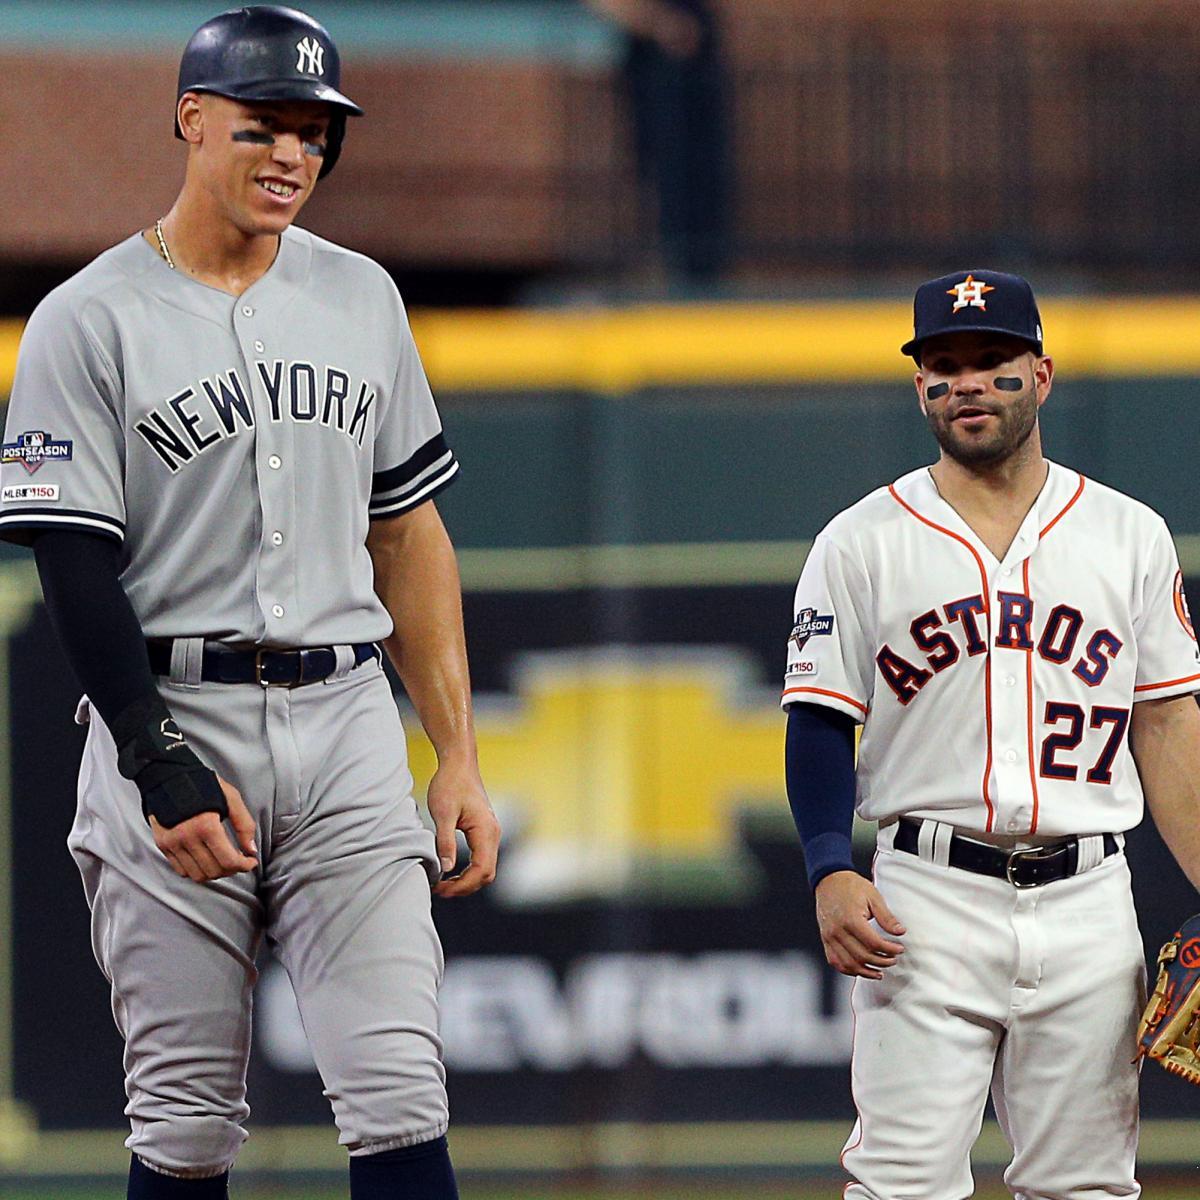 Yankees' Aaron Judge: Astros' 2017 WS Title Wasn't Earned, Punishment Was Weak